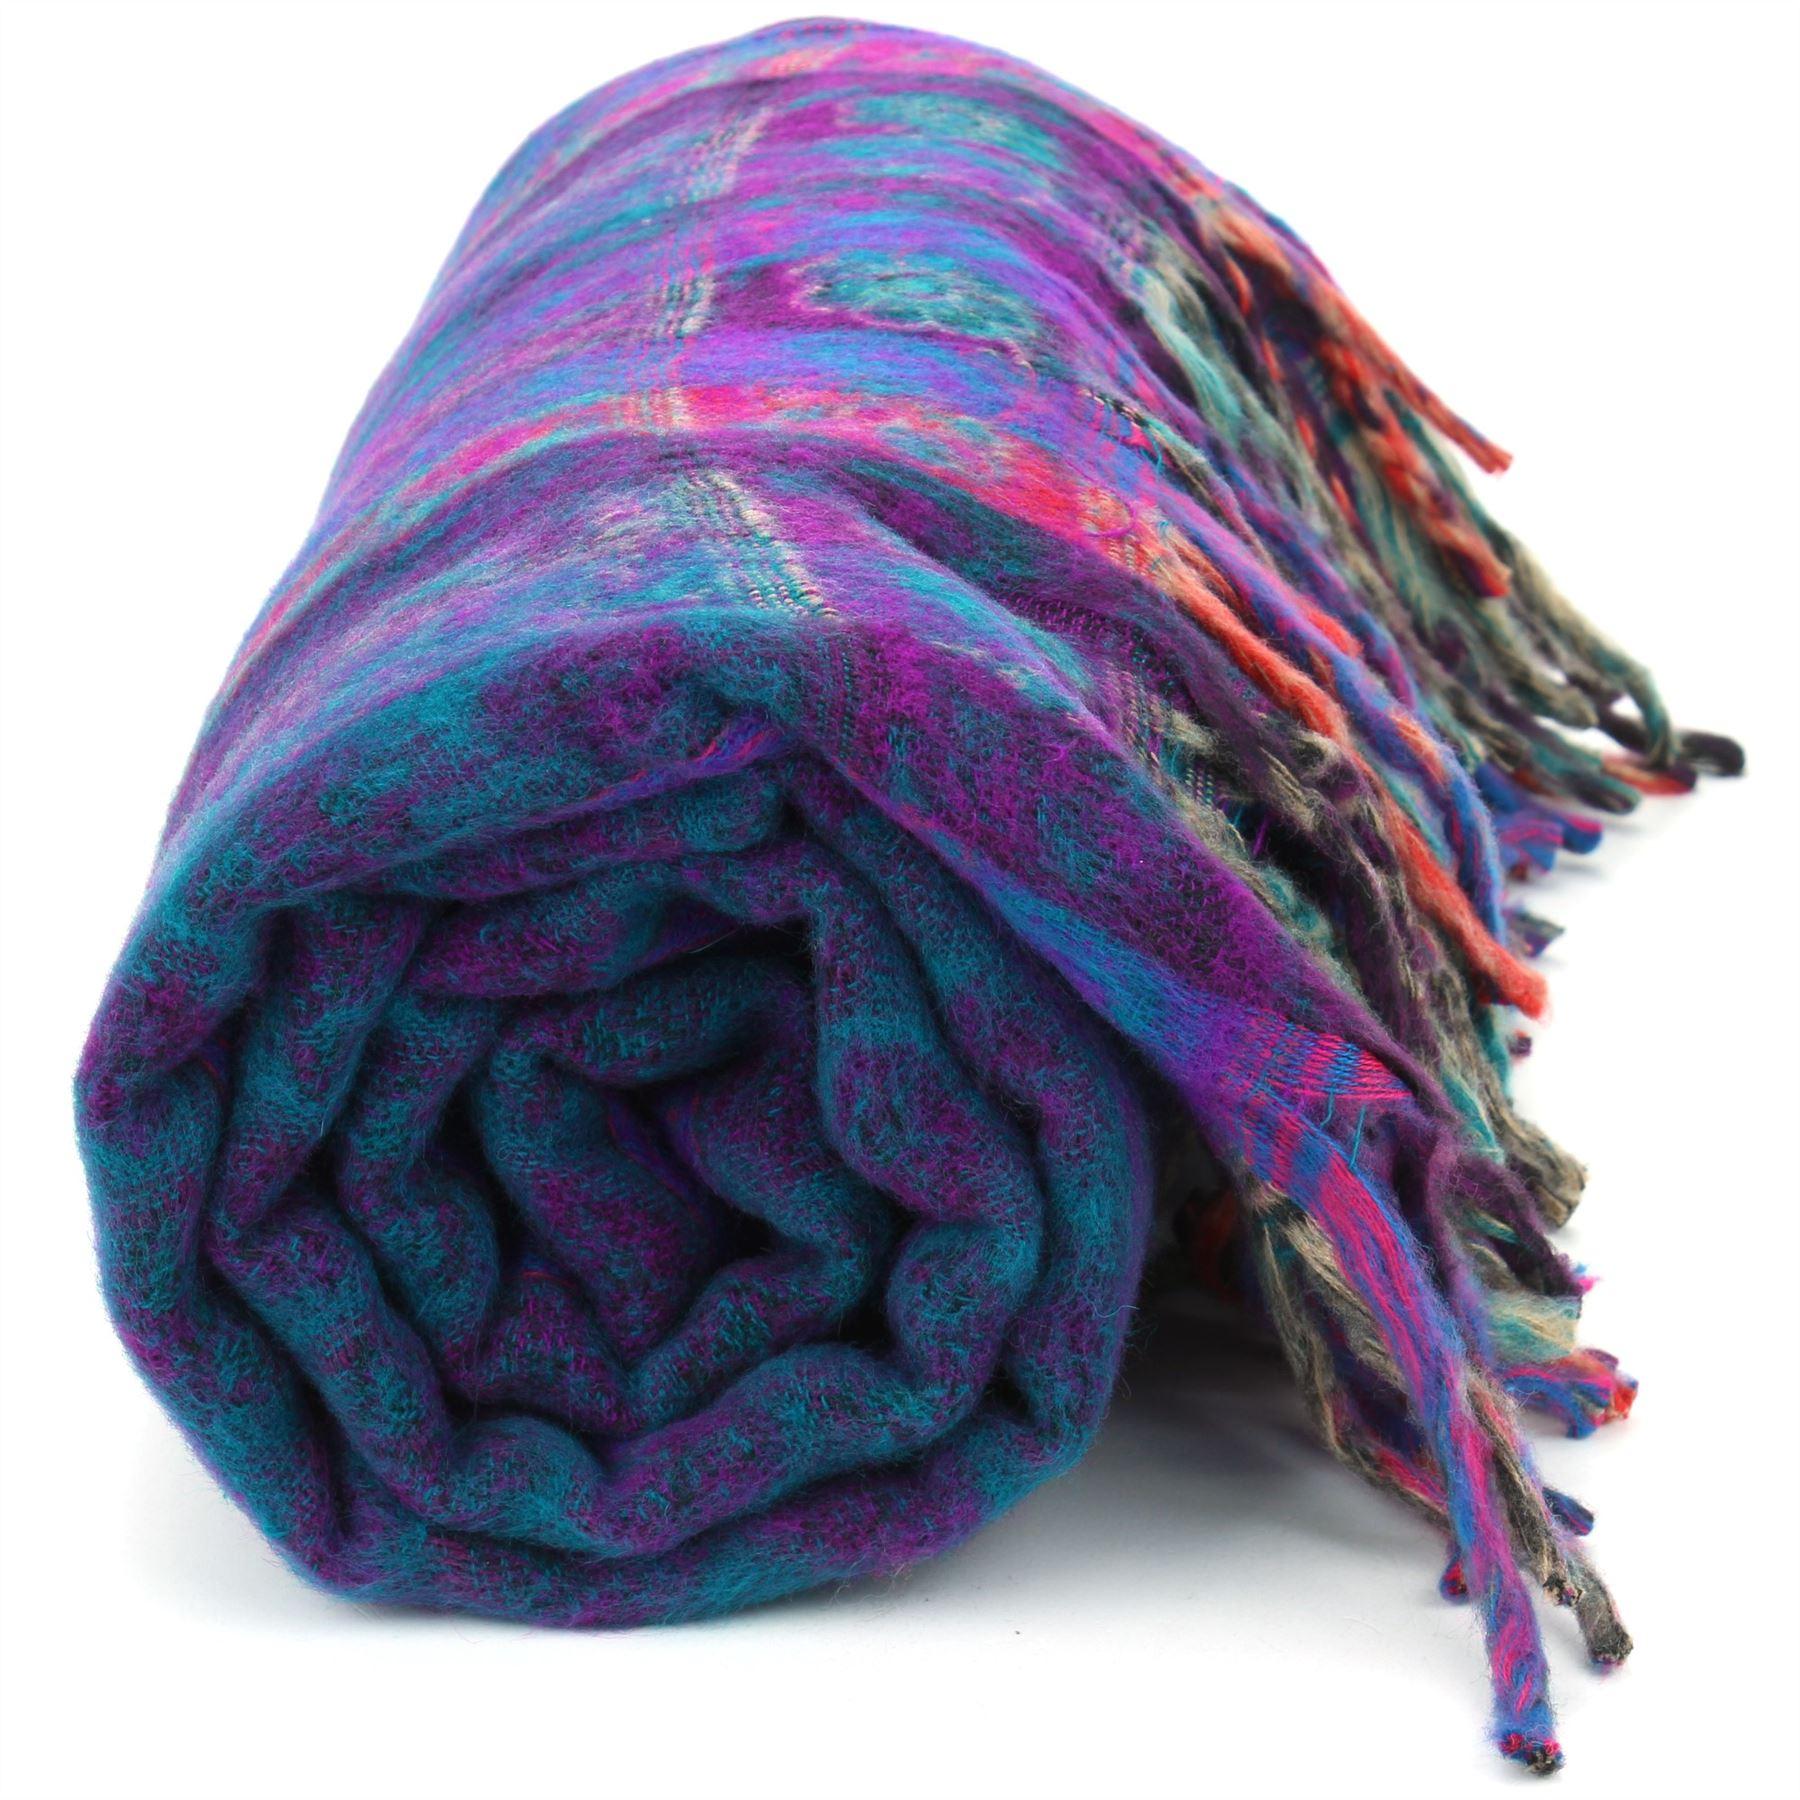 Acrylic-Wool-Blanket-Shawl-Wrap-Throw-Finest-Softest-India-Stripe-Paisley-Travel thumbnail 24